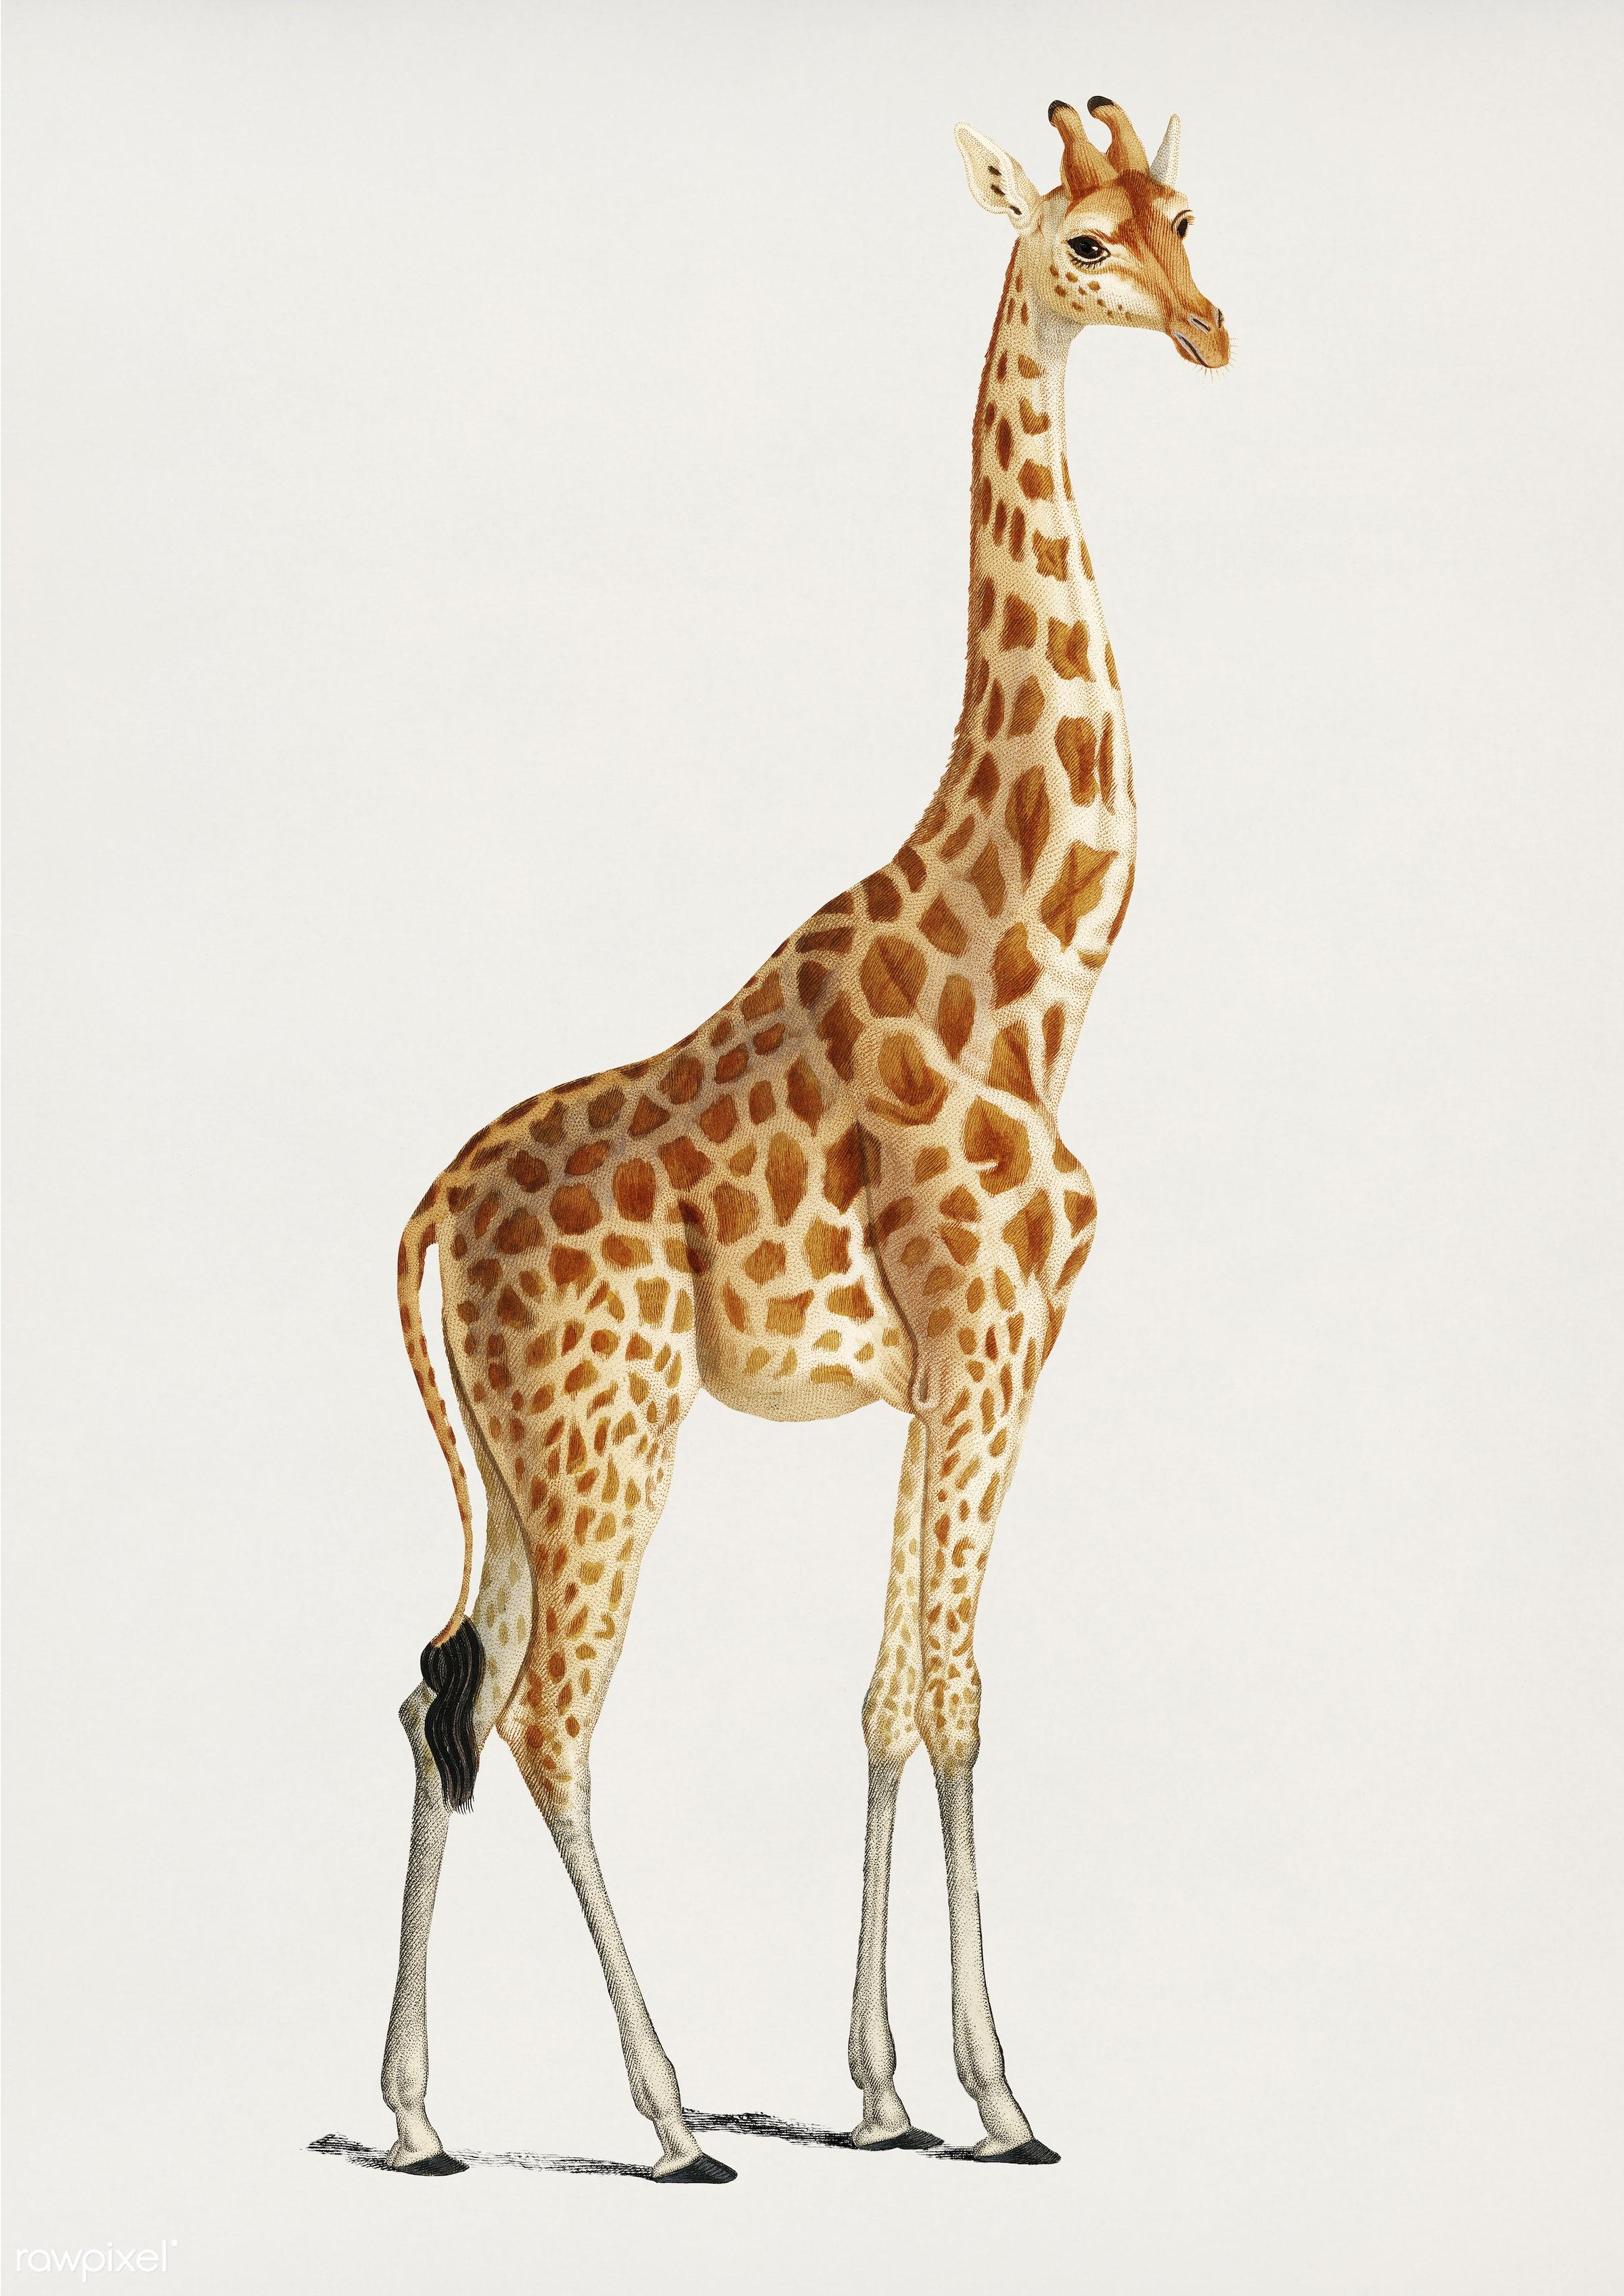 Vintage Illustration of Giraffe (Giraffa camelopardalis) - giraffe, animal, drawing, ancient, antique, artwork, charles,...